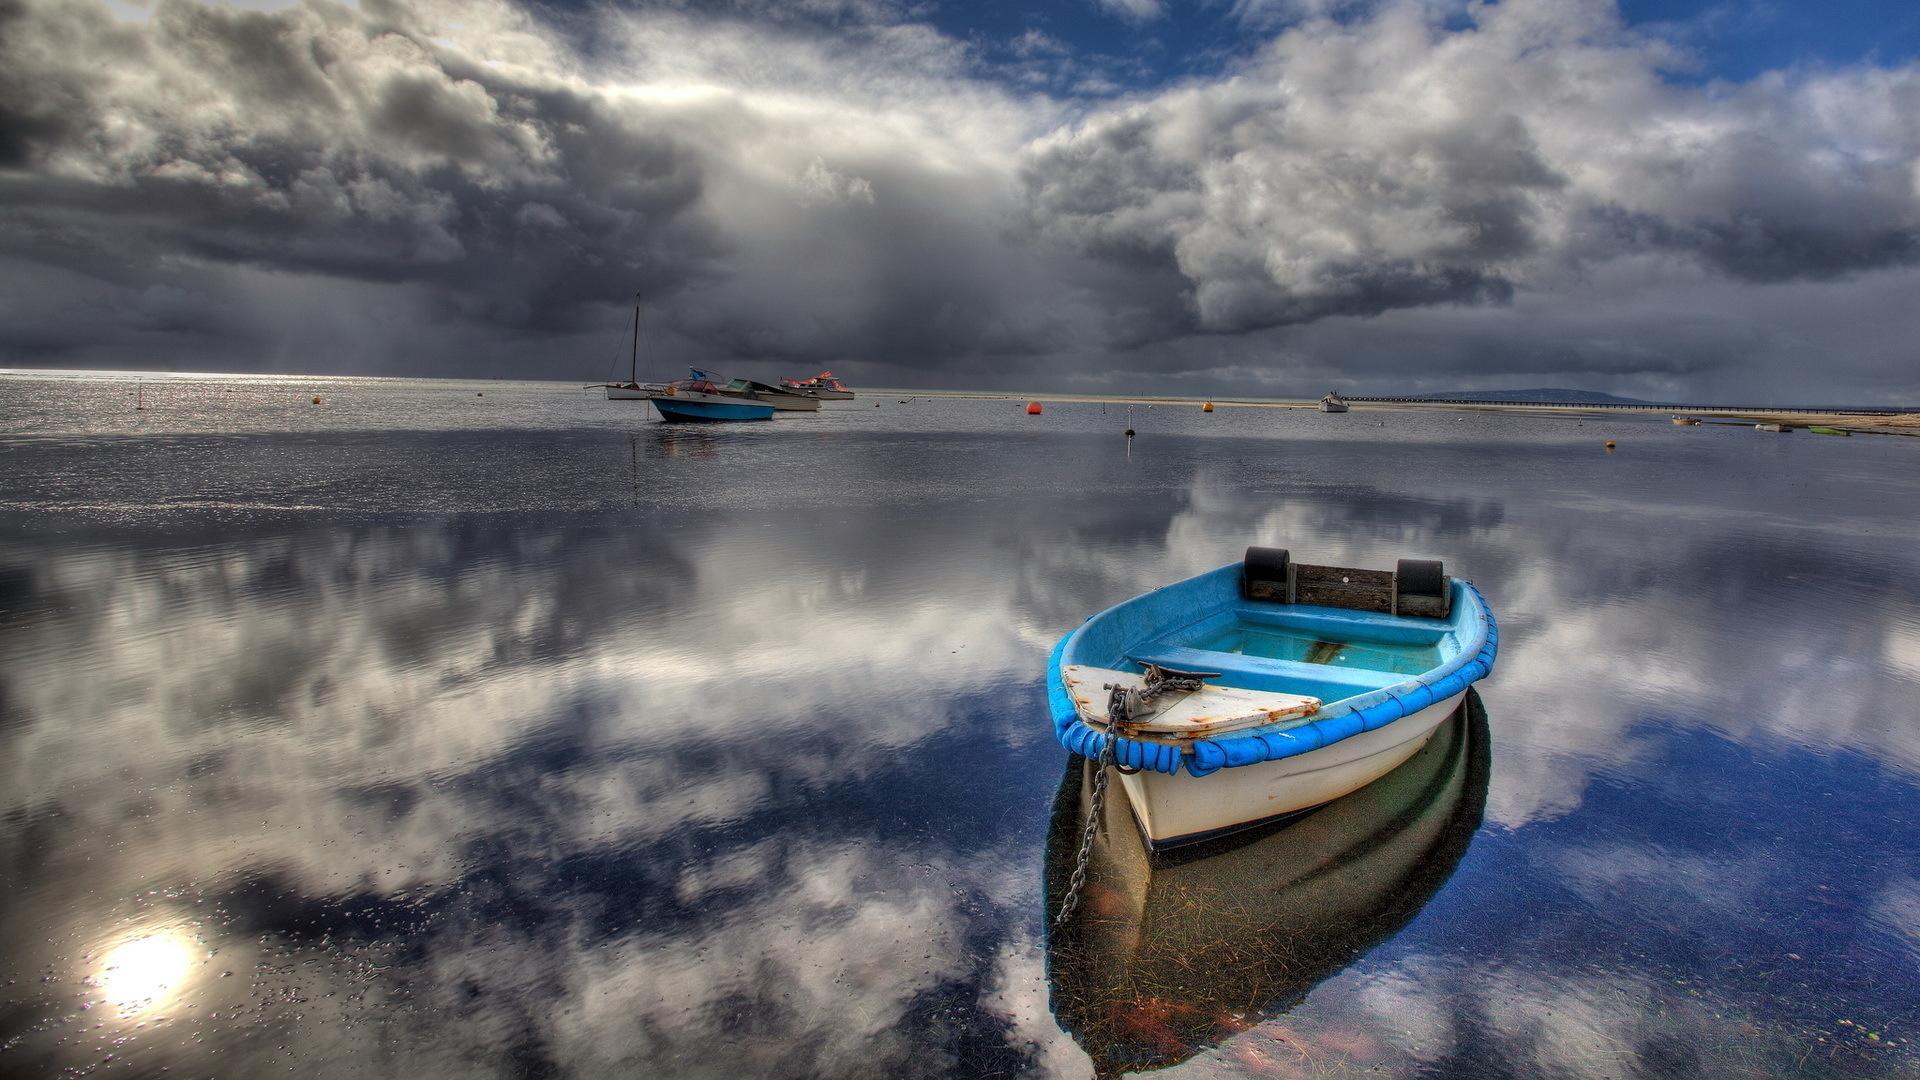 картинки на телефон лодка море пошленьких